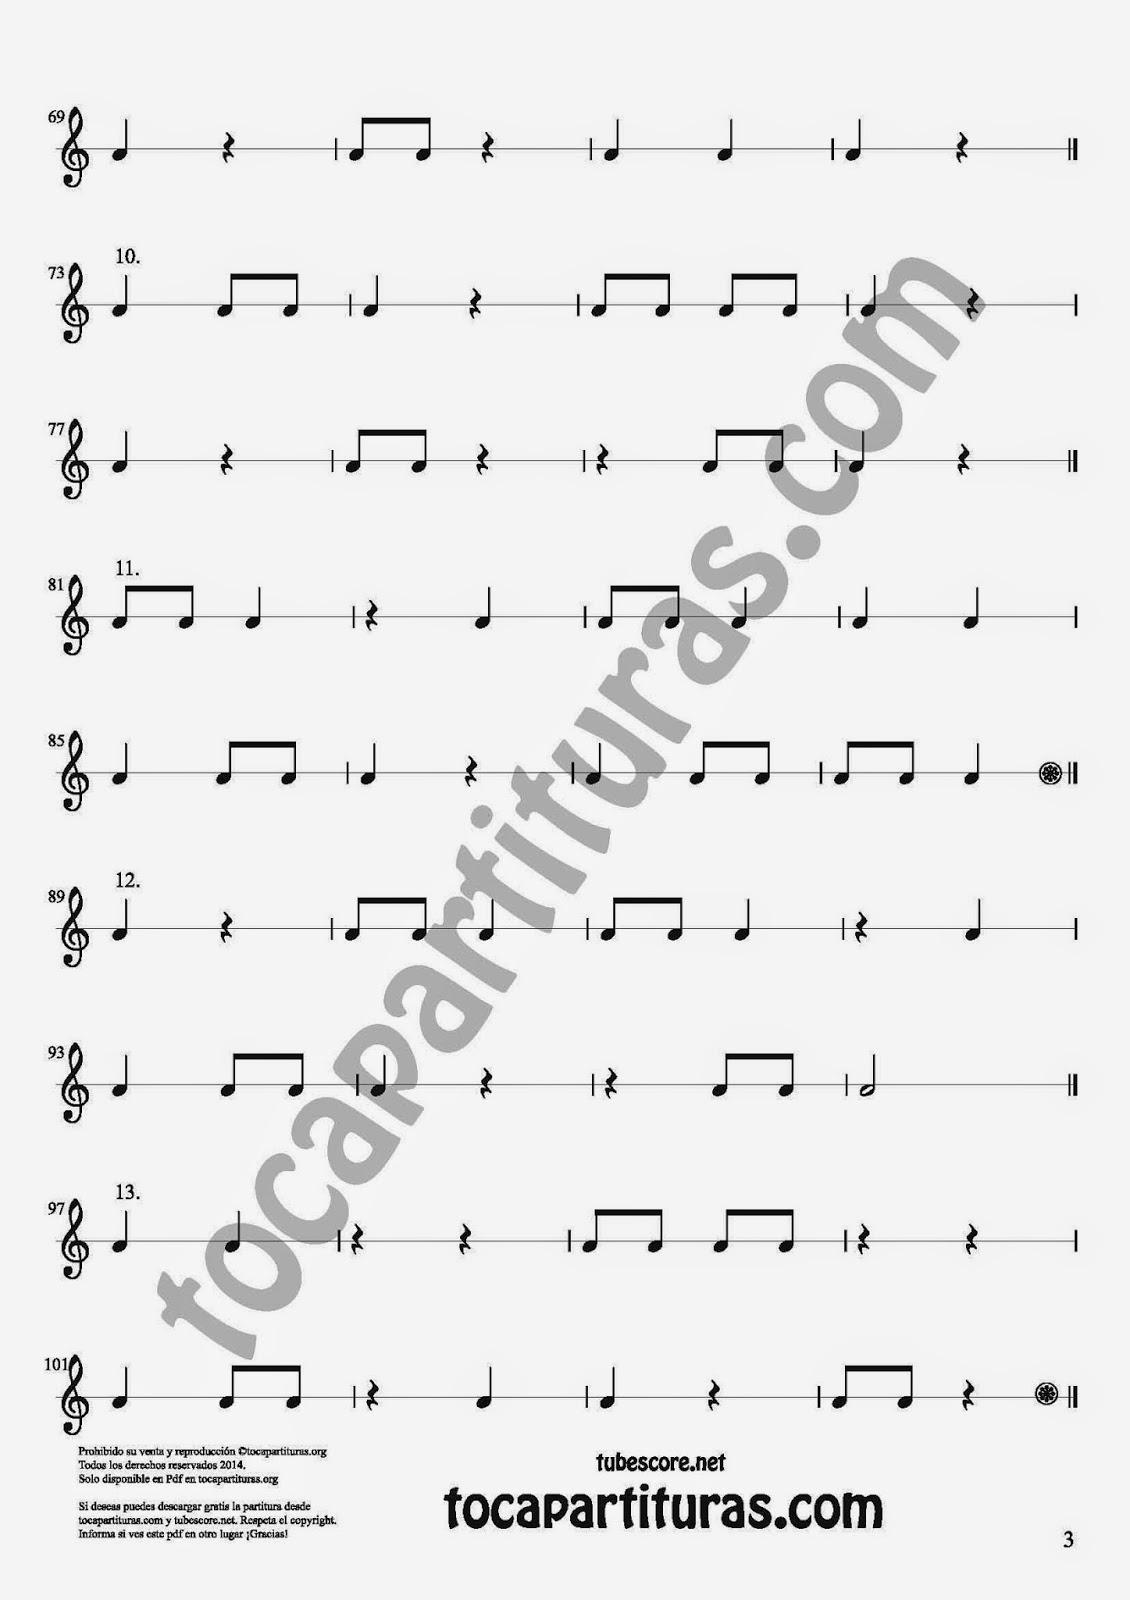 3. 27 Ejercicios Rítmicos para Aprener Solfeo en el Compás de 2/4 Aprender negras, corcheas, blancas y sus silencios. Easy Rithm Sheet Music for quarter notes, half notes, 1/8 notes and silences